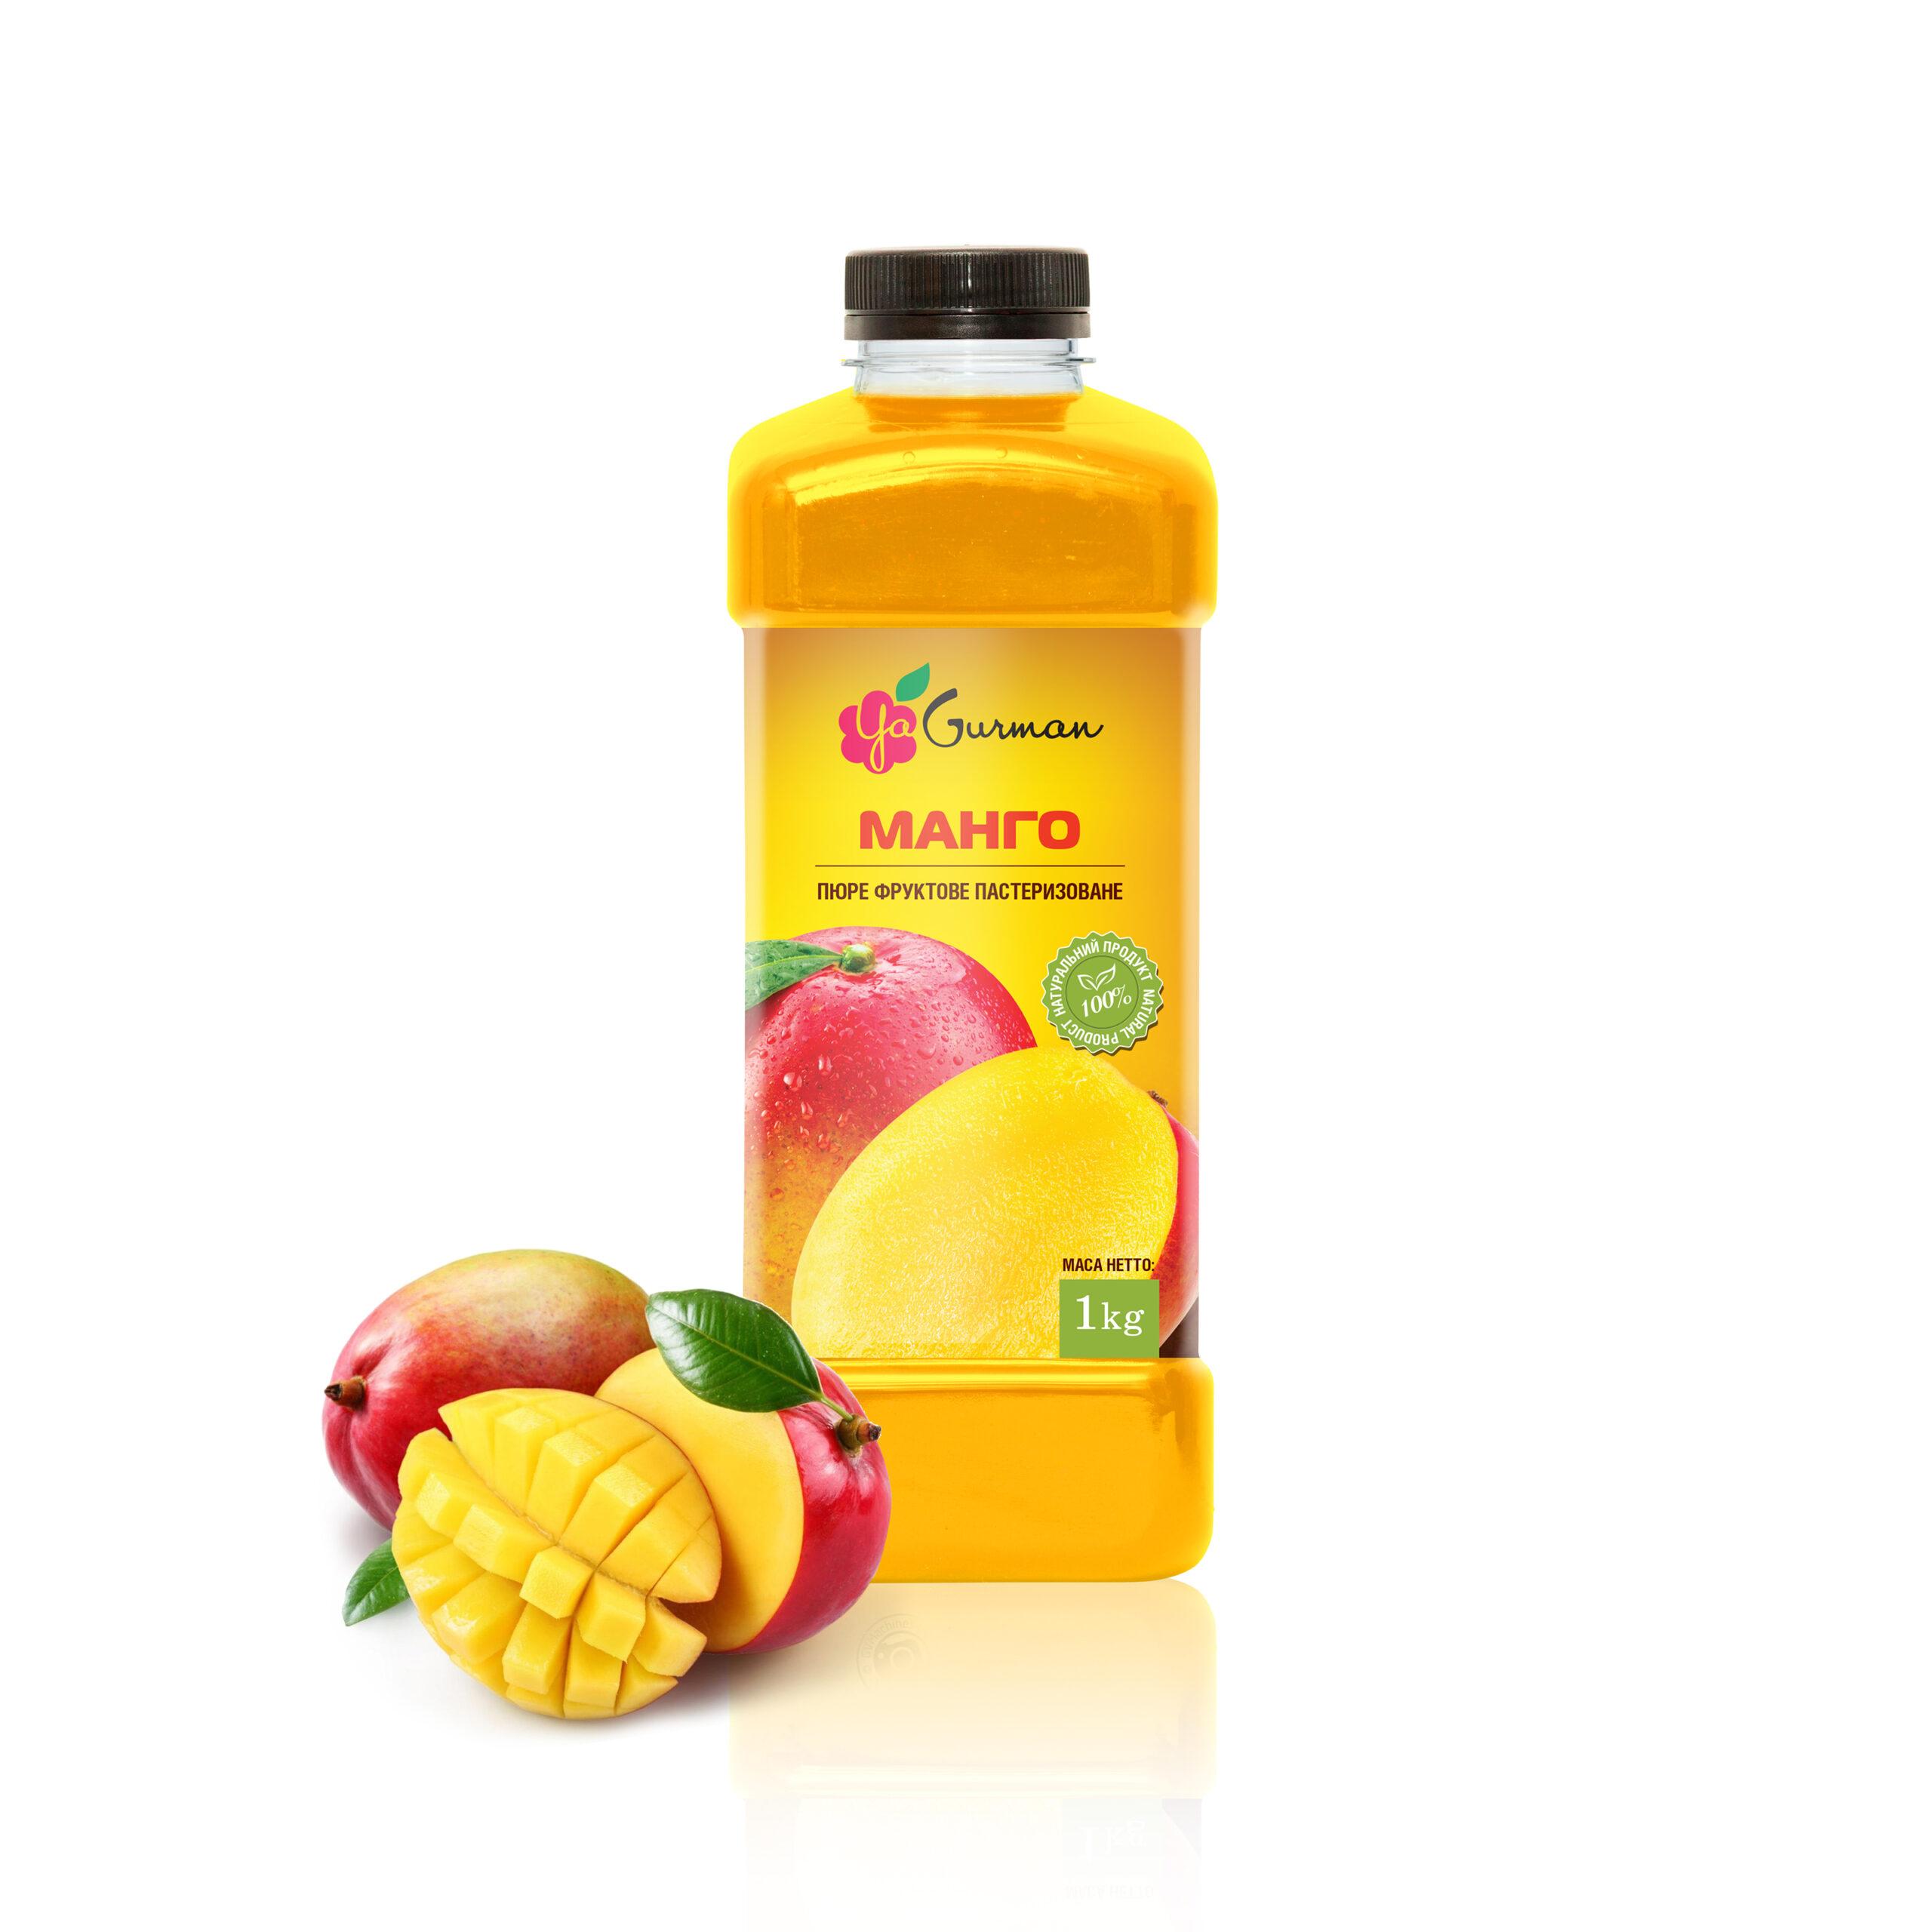 манго_бутылка_1кг